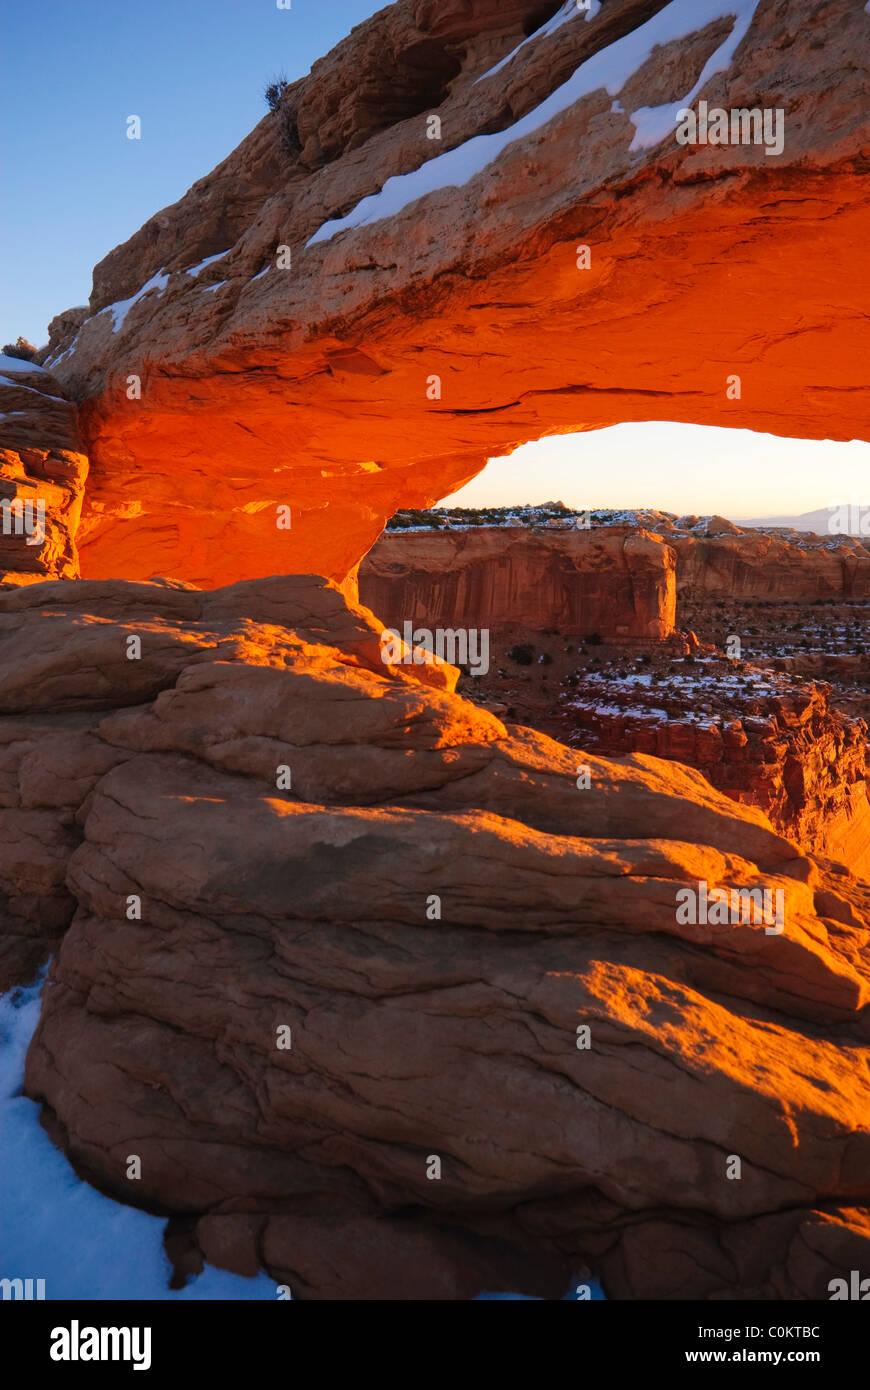 Mesa Arch, Canyonlands National Park, Utah - Stock Image